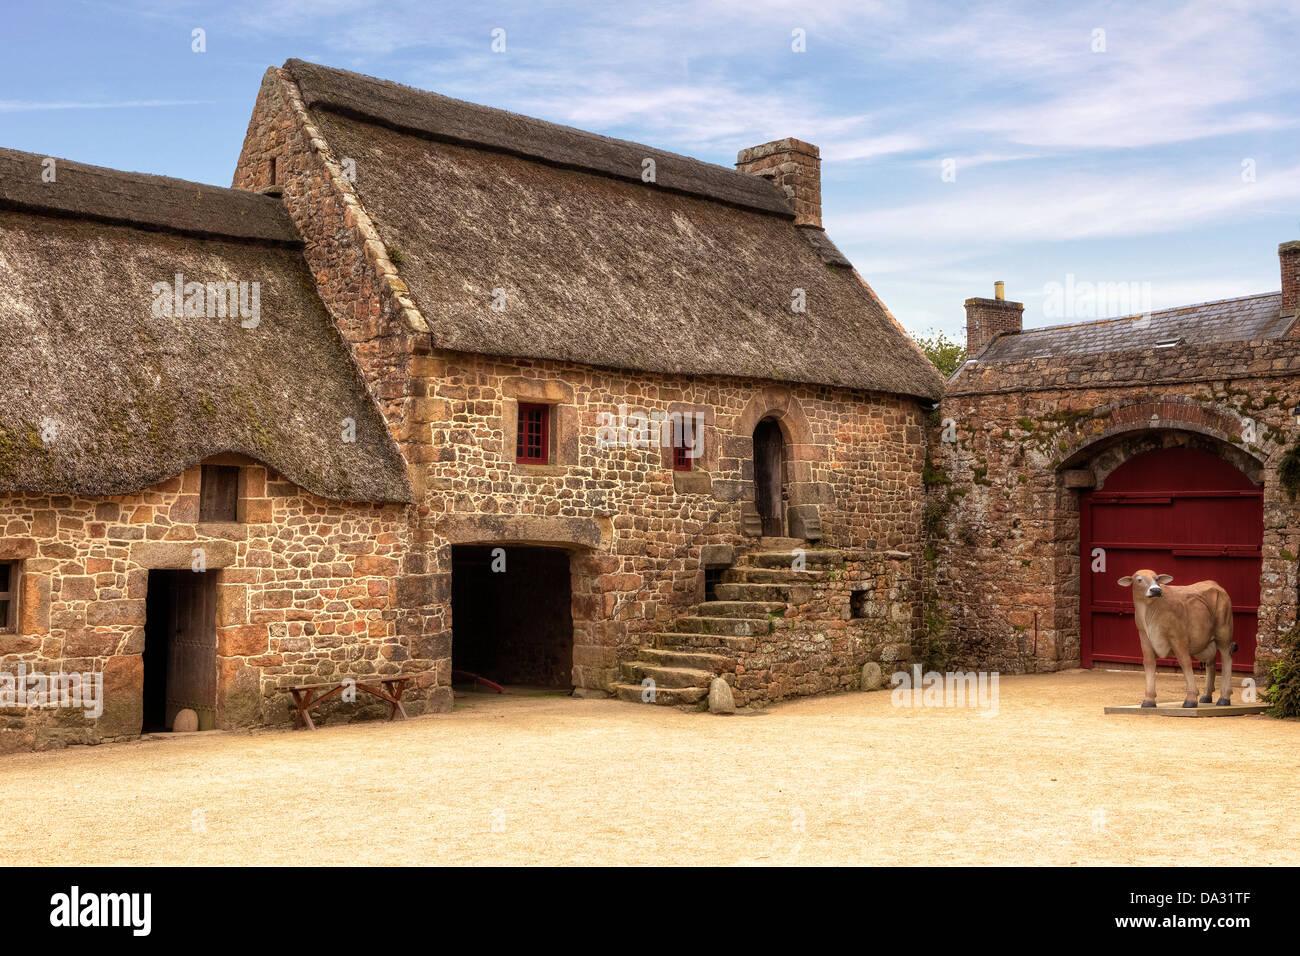 Hamptonne Country Life Museum, Jersey, United Kingdom Stock Photo ...